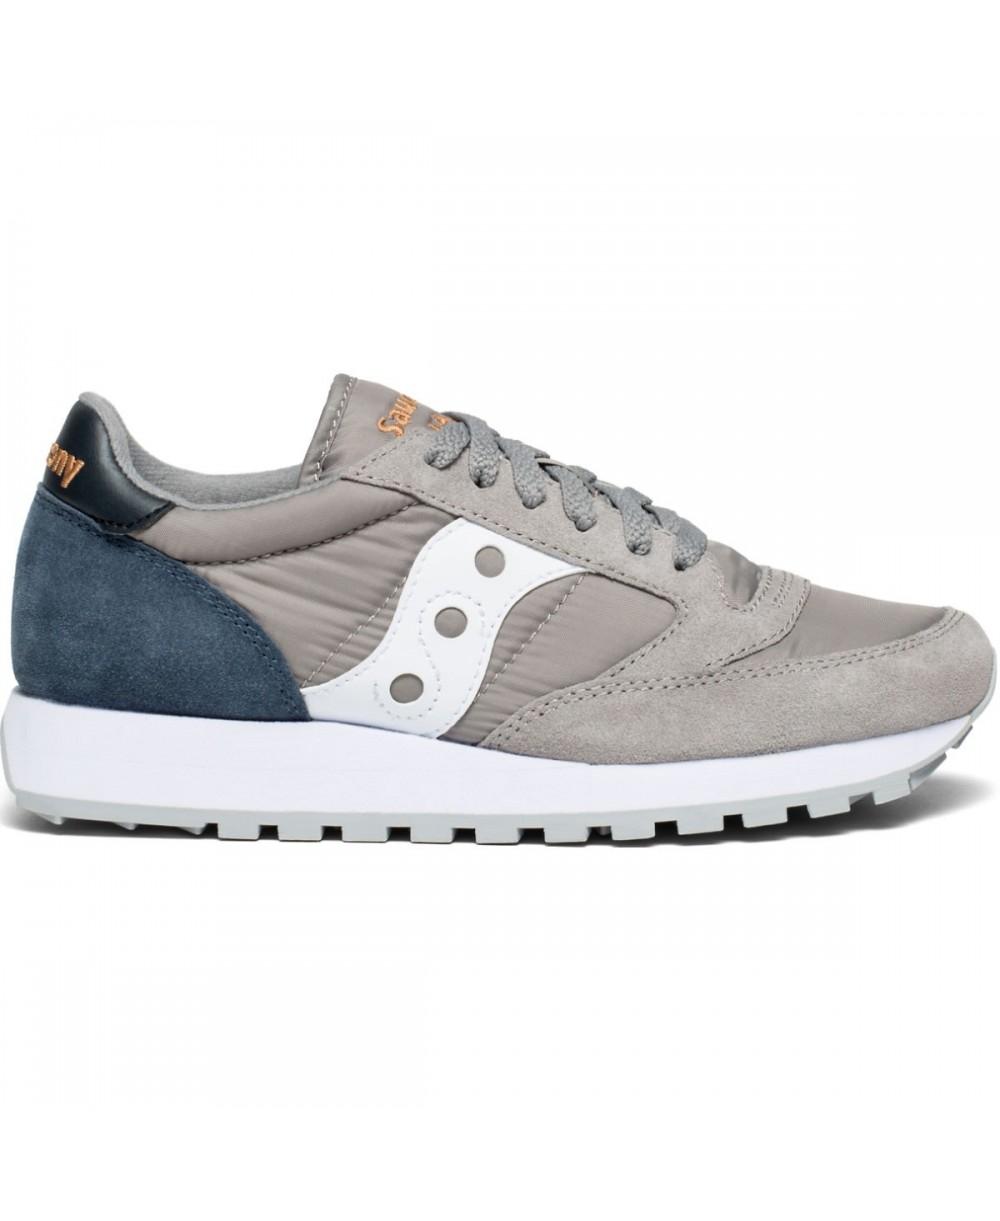 Saucony Jazz Original Scarpe Sneakers Donna Grey Navy 183b57e9c3d